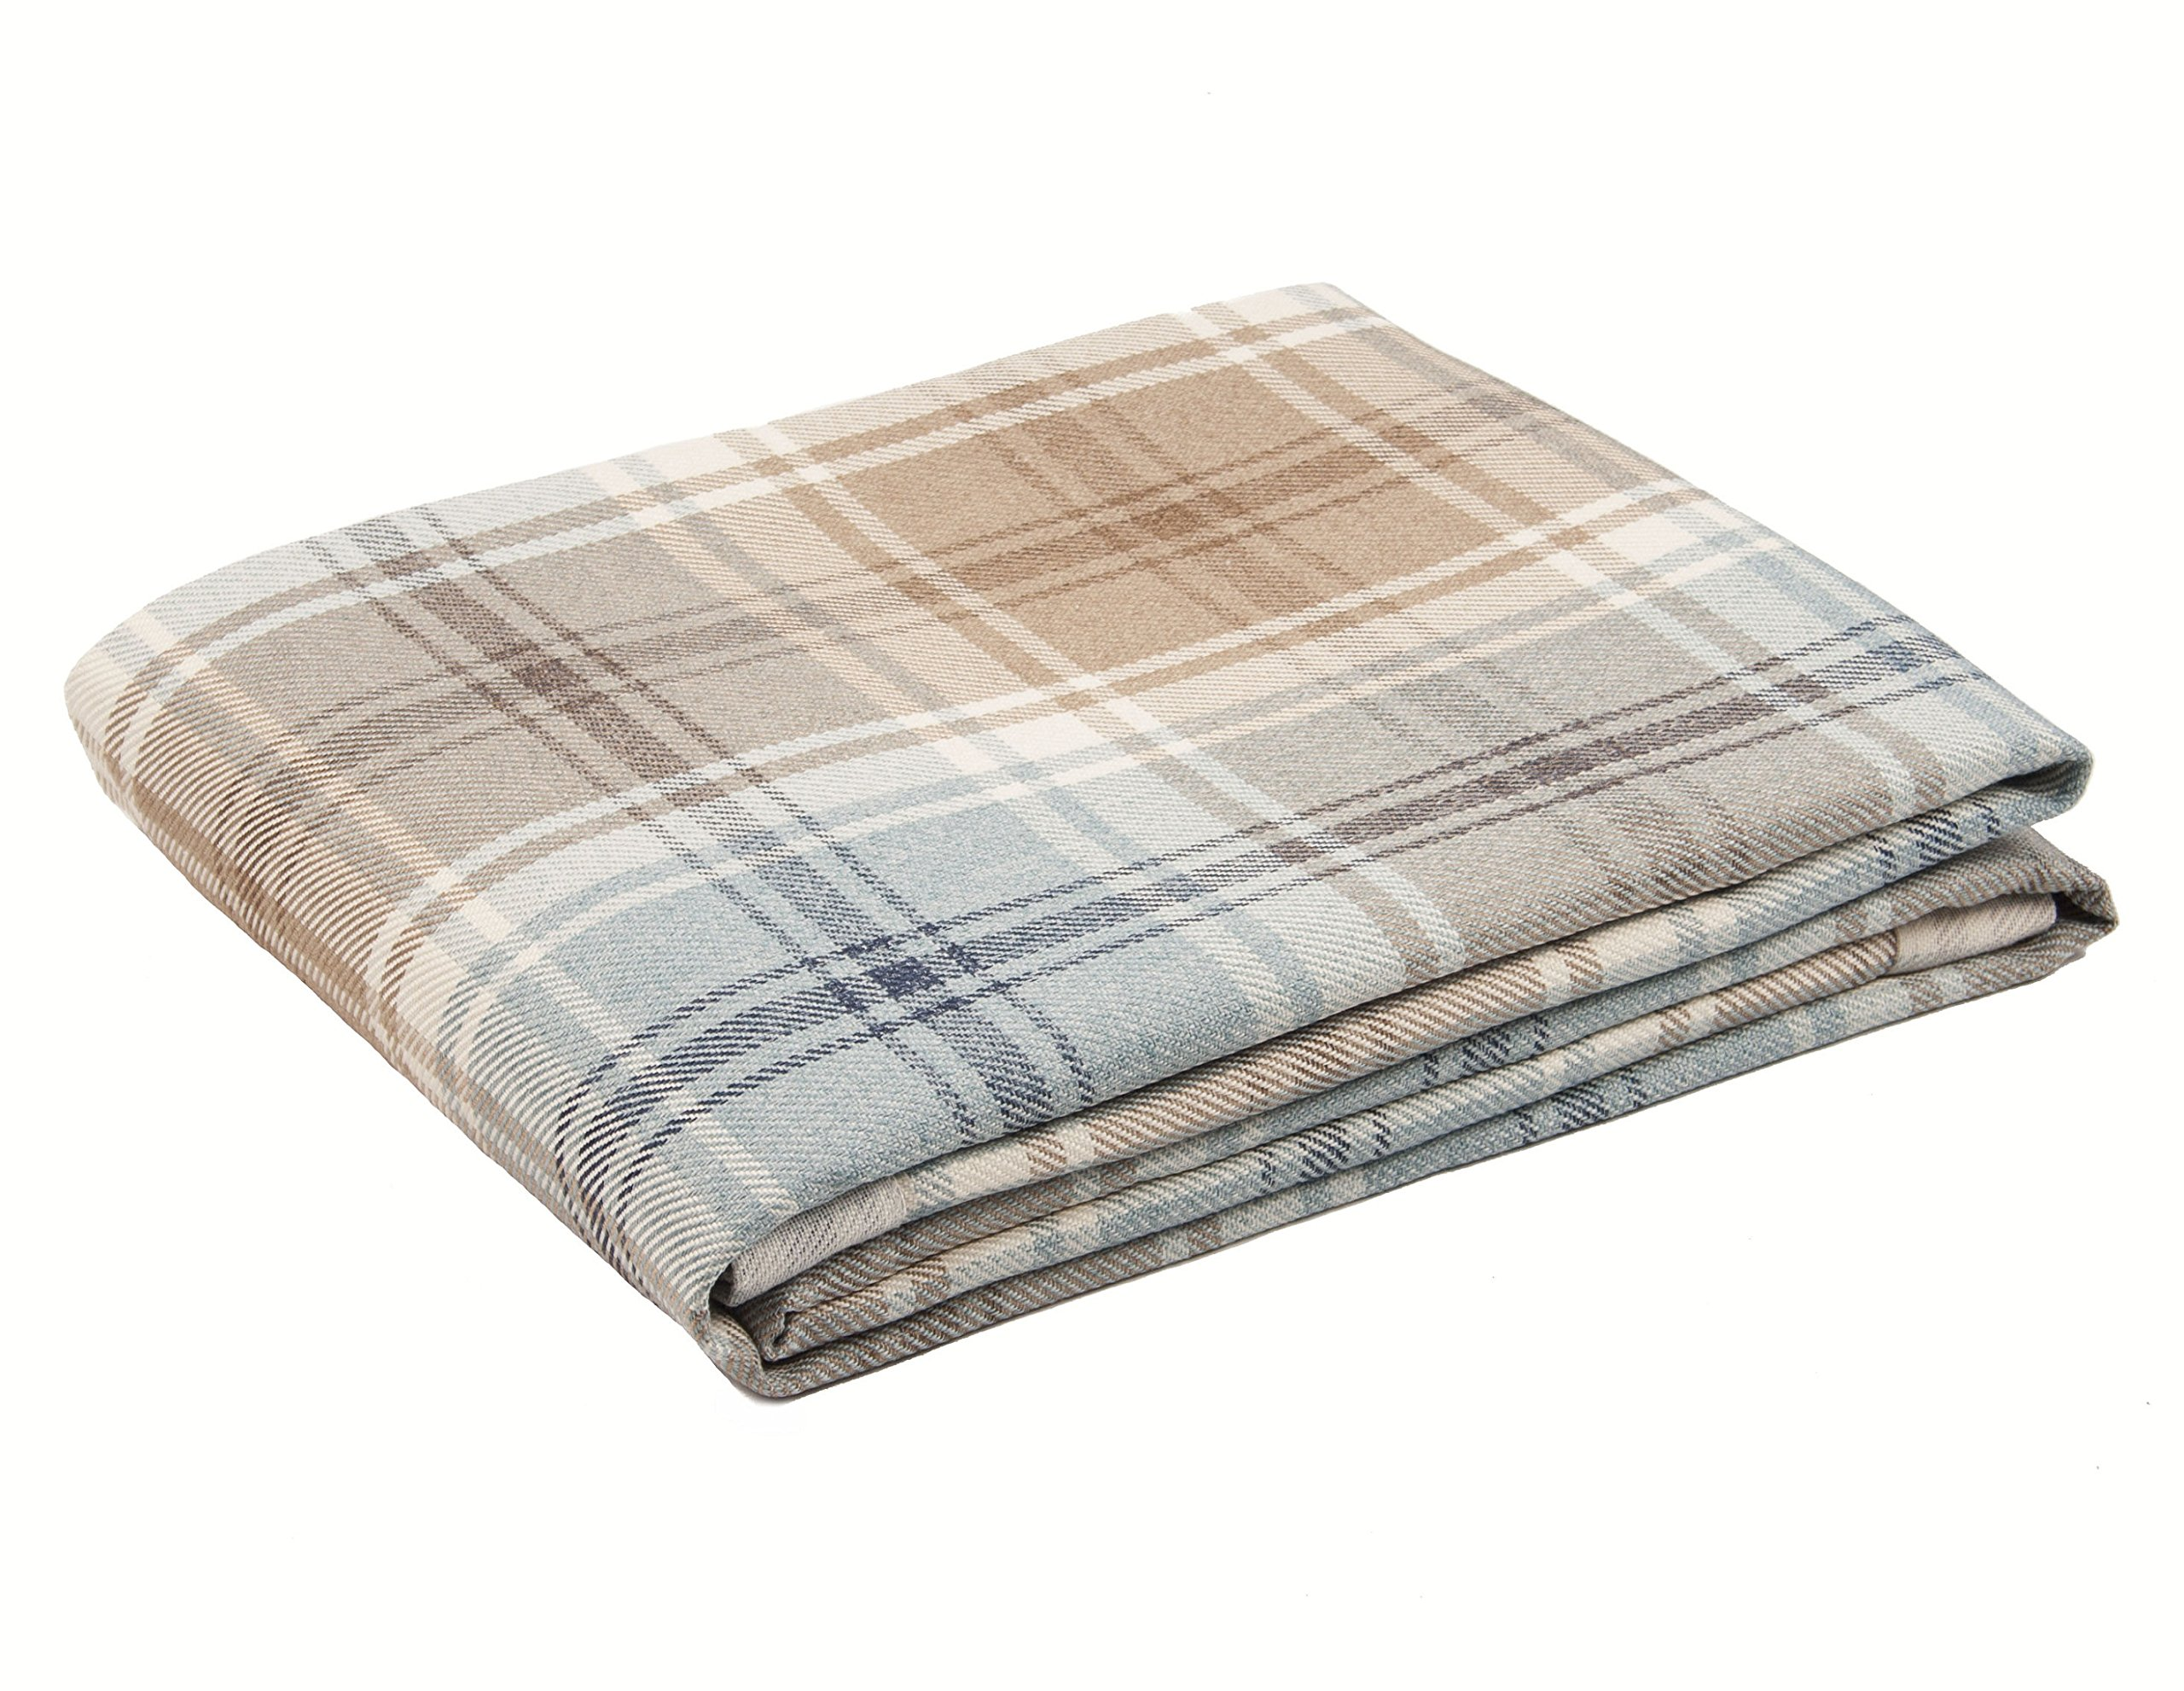 McAlister Angus XX-Large Decorative Throw Blanket | 105x150'' Sky Blue & White | Burlap-Texture Buffalo Plaid | Tartan Check Farmhouse Accent Décor